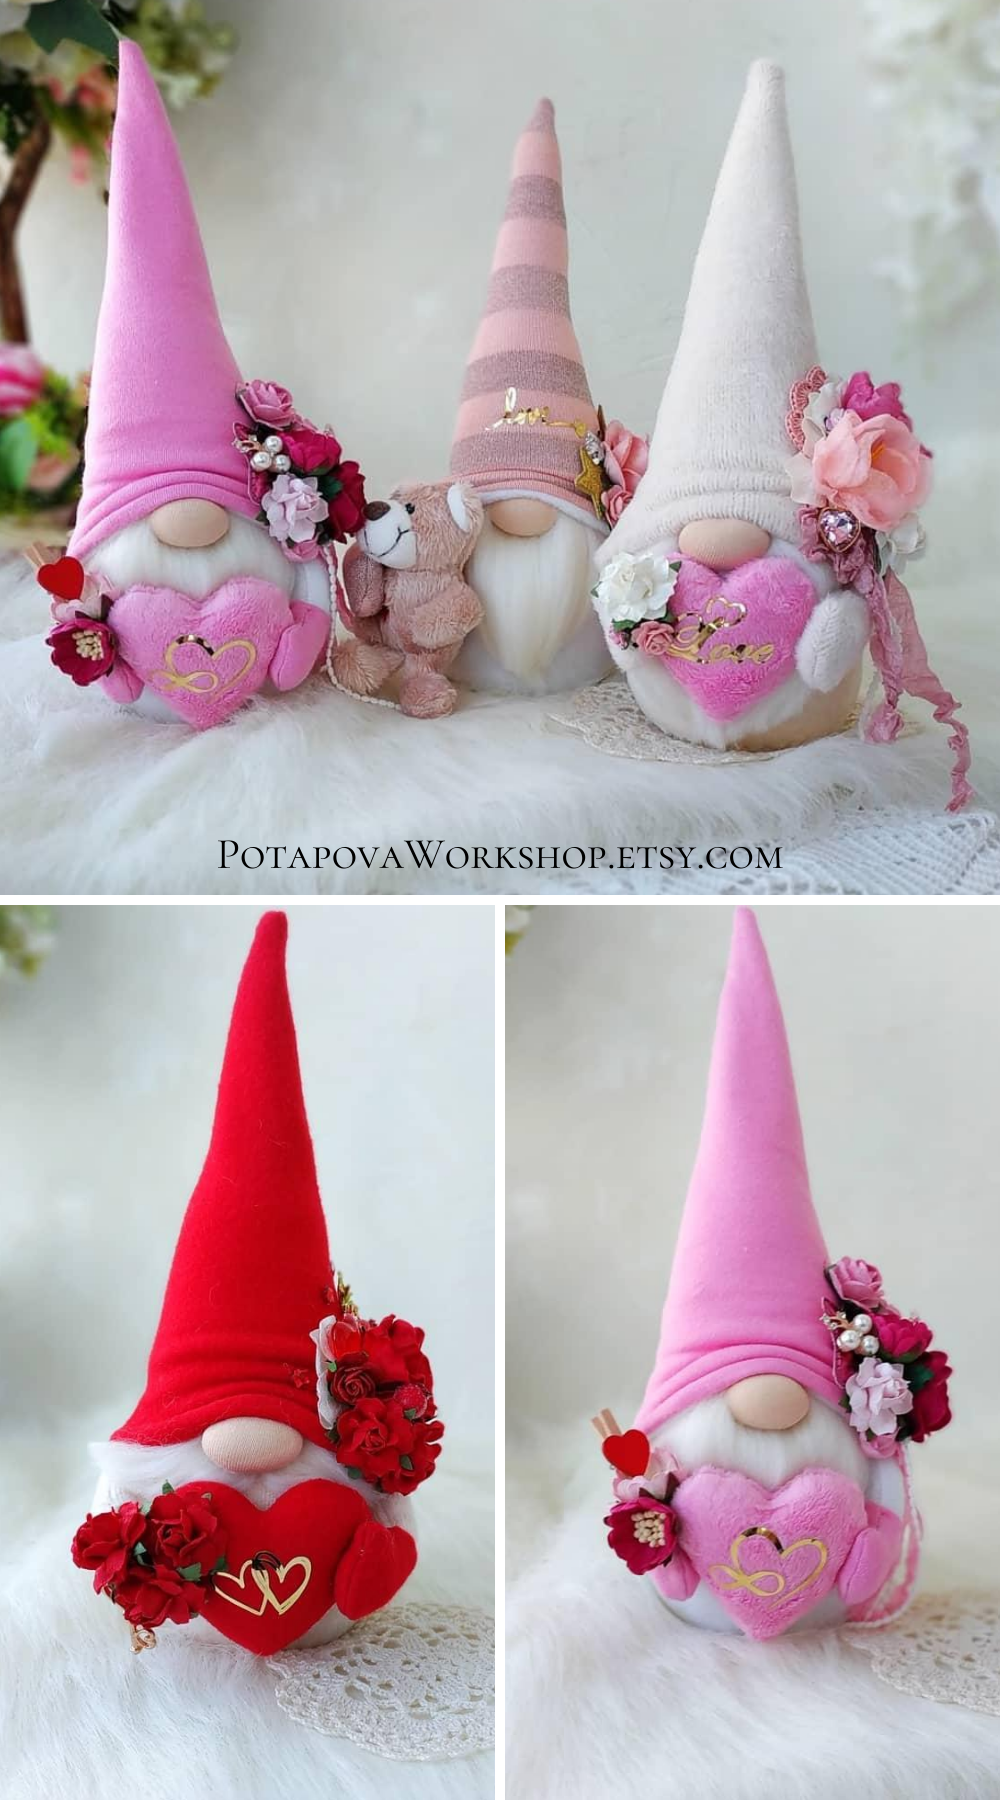 Flower gnomes | Sweetheart gnomes | Etsy